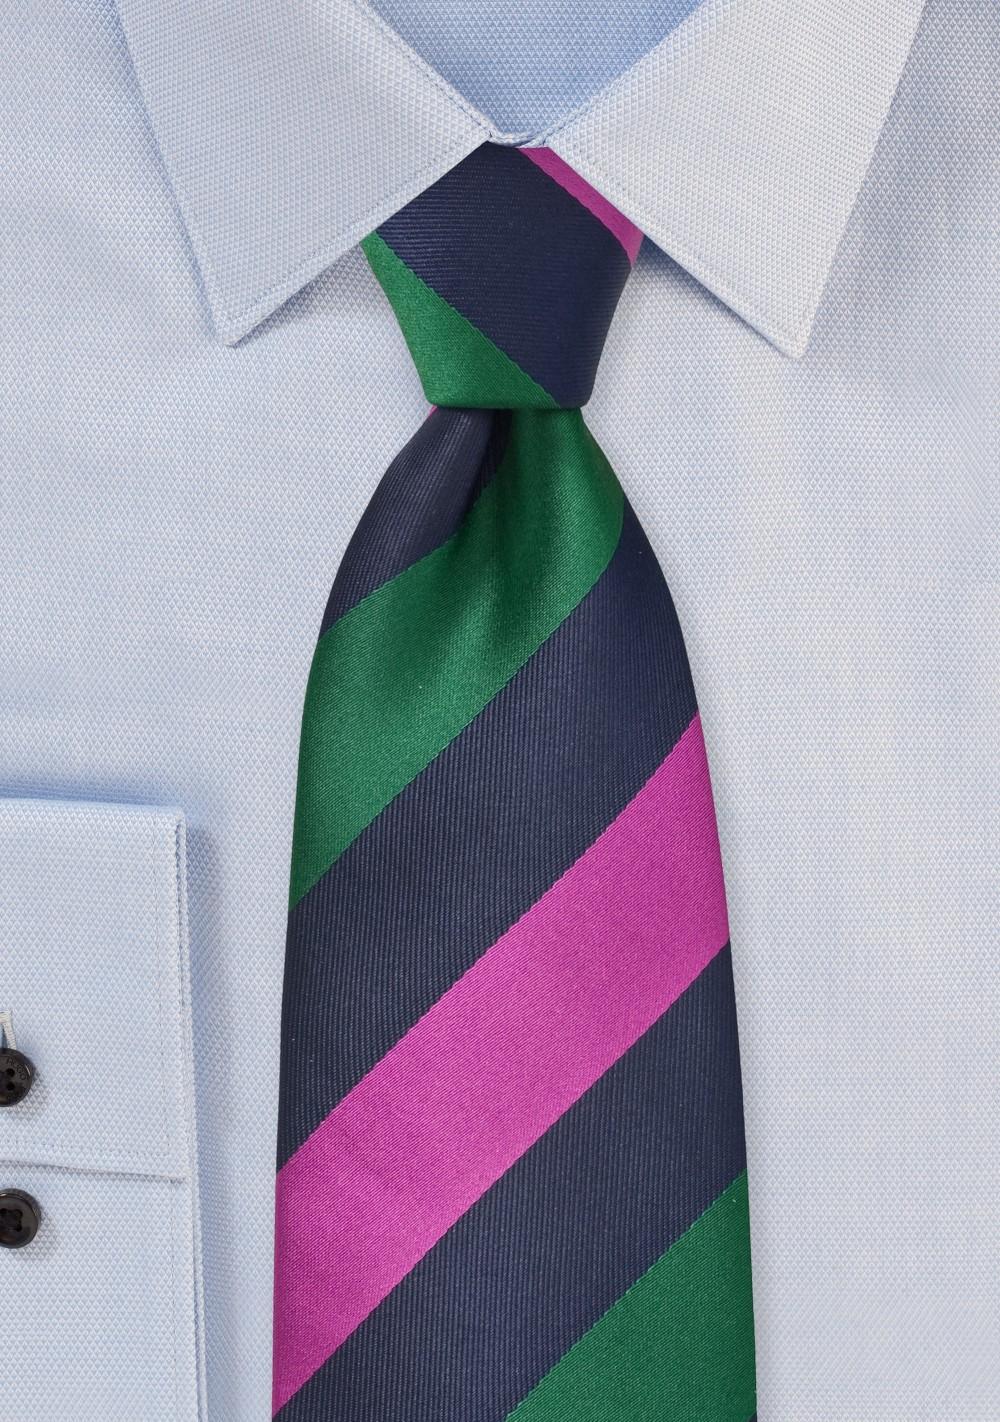 Striped Tie in Navy, Hunter Green, Fuchsia